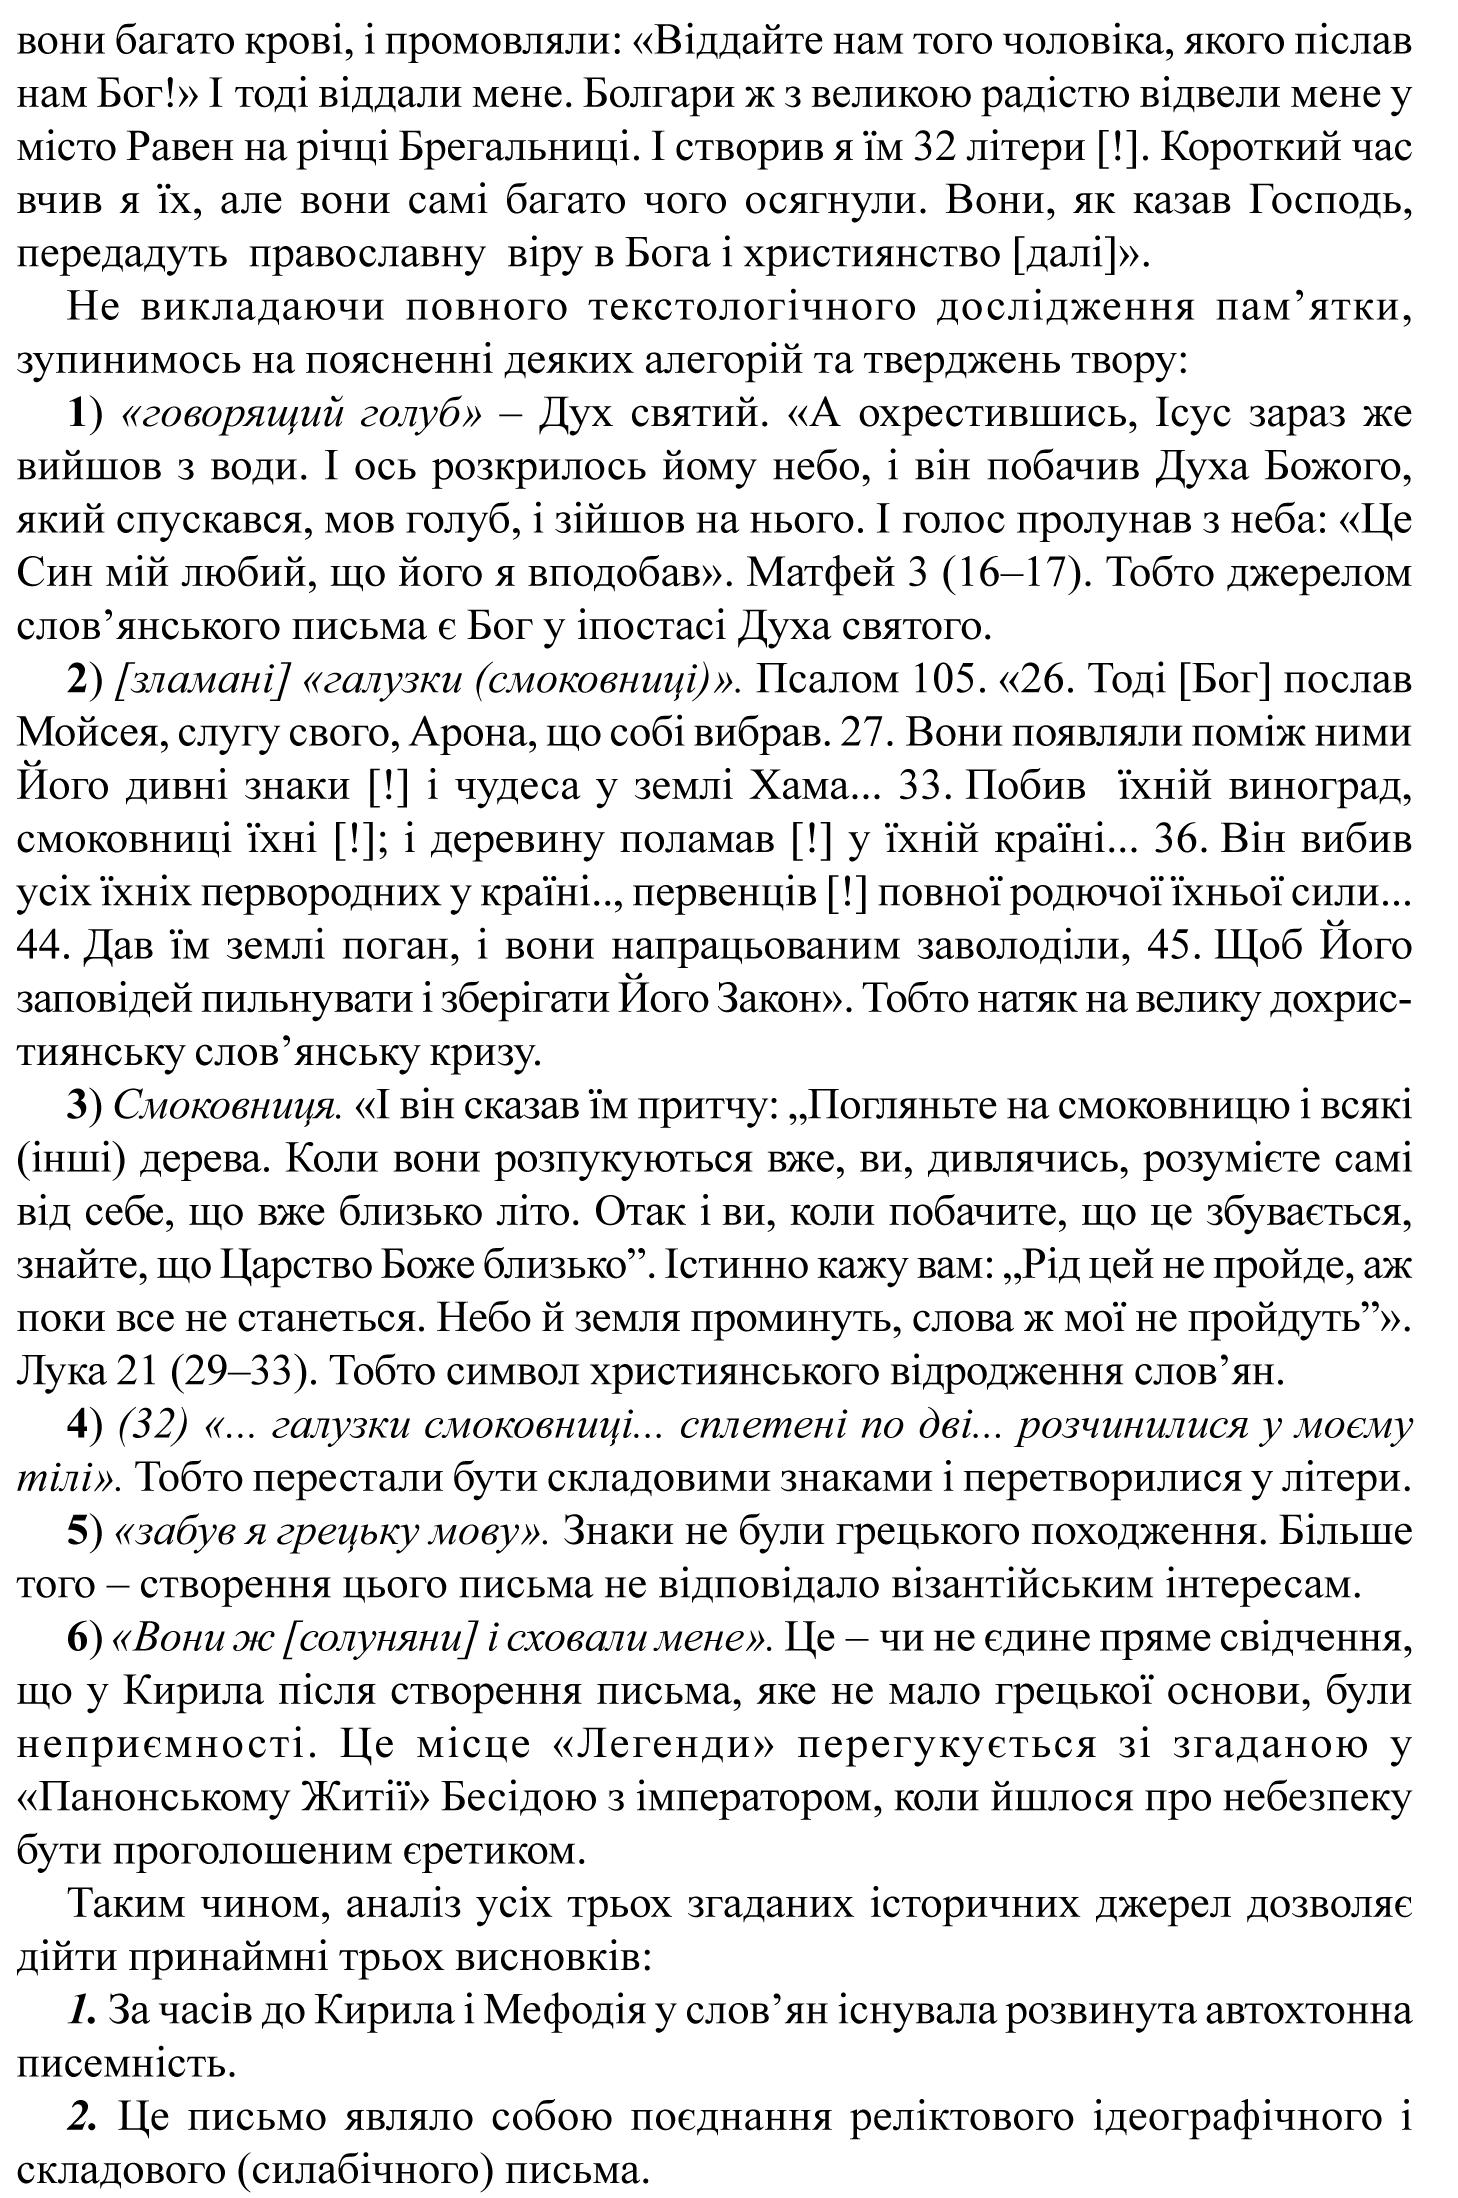 Докирил письмо-7.png